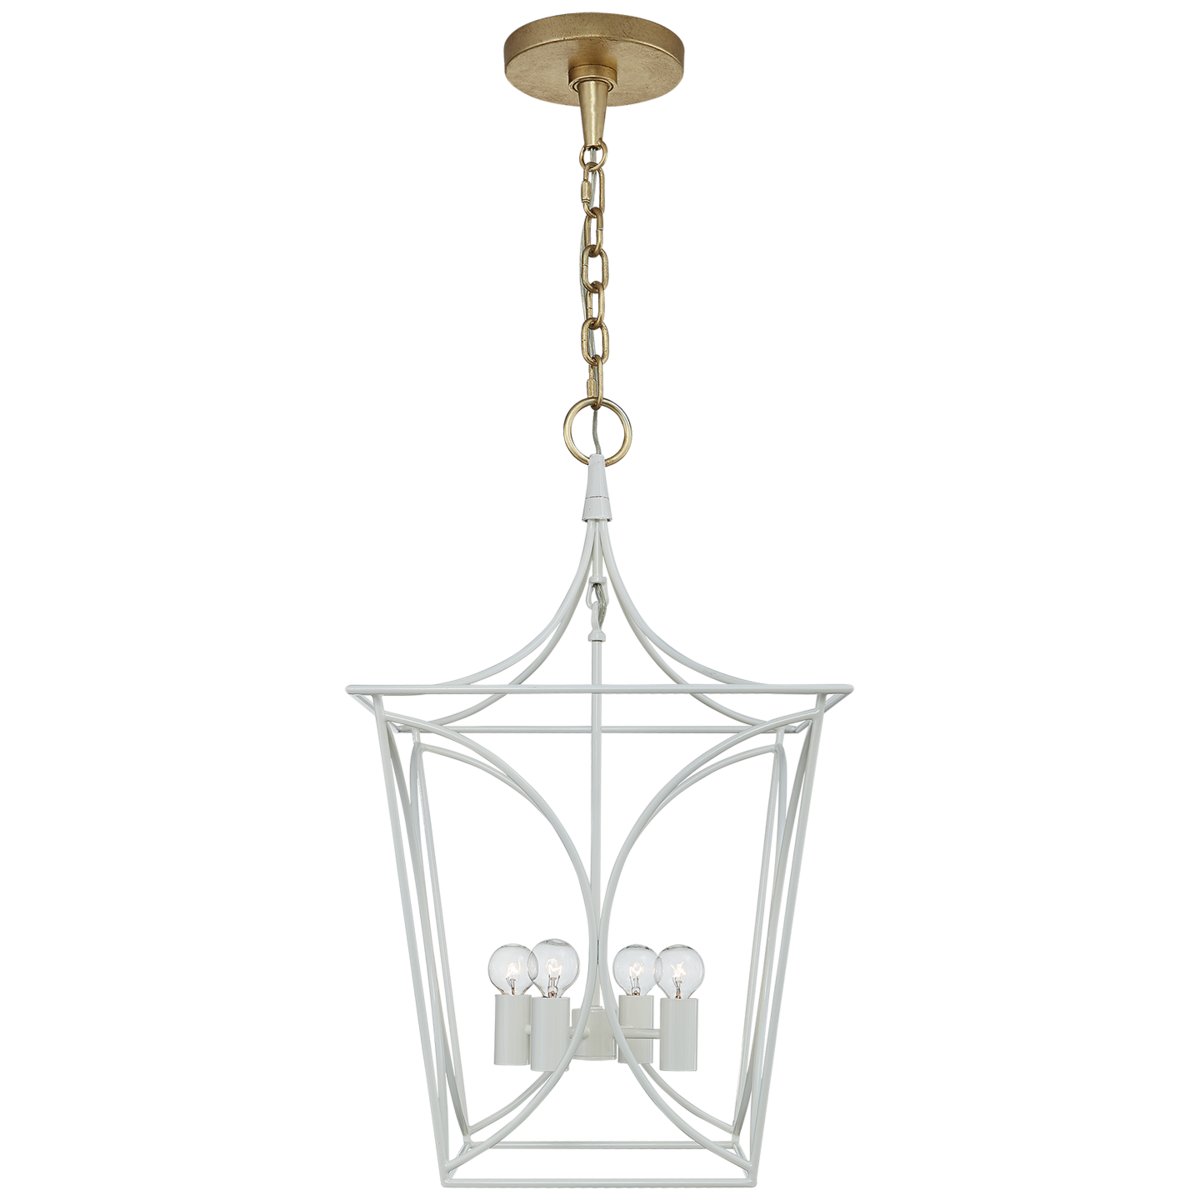 Cavanagh Small Lantern